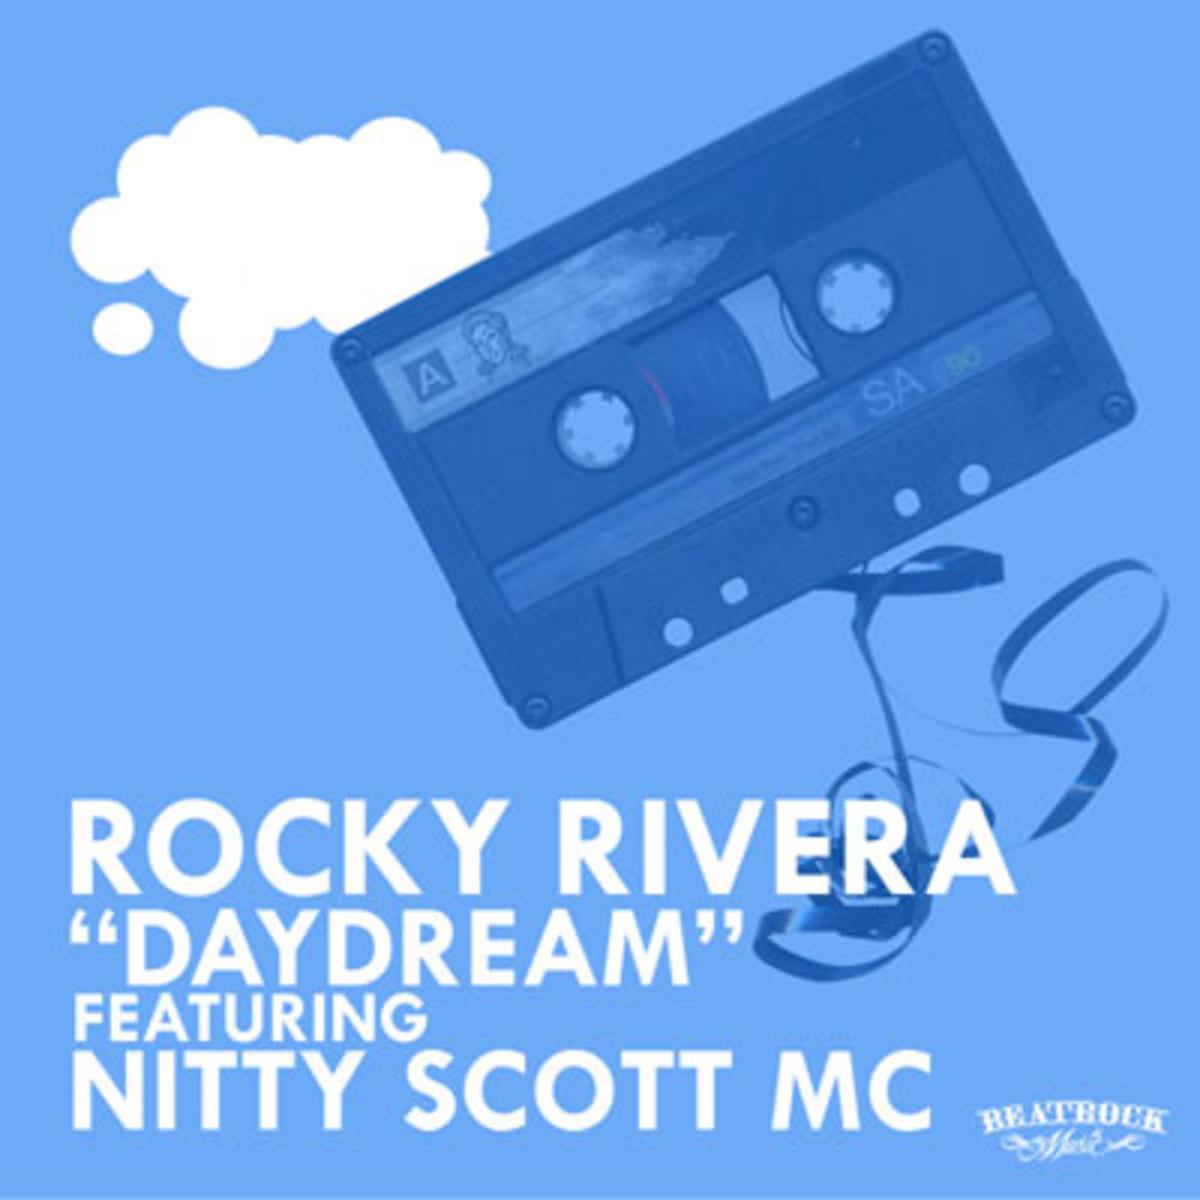 rockyrivera-daydream.jpg